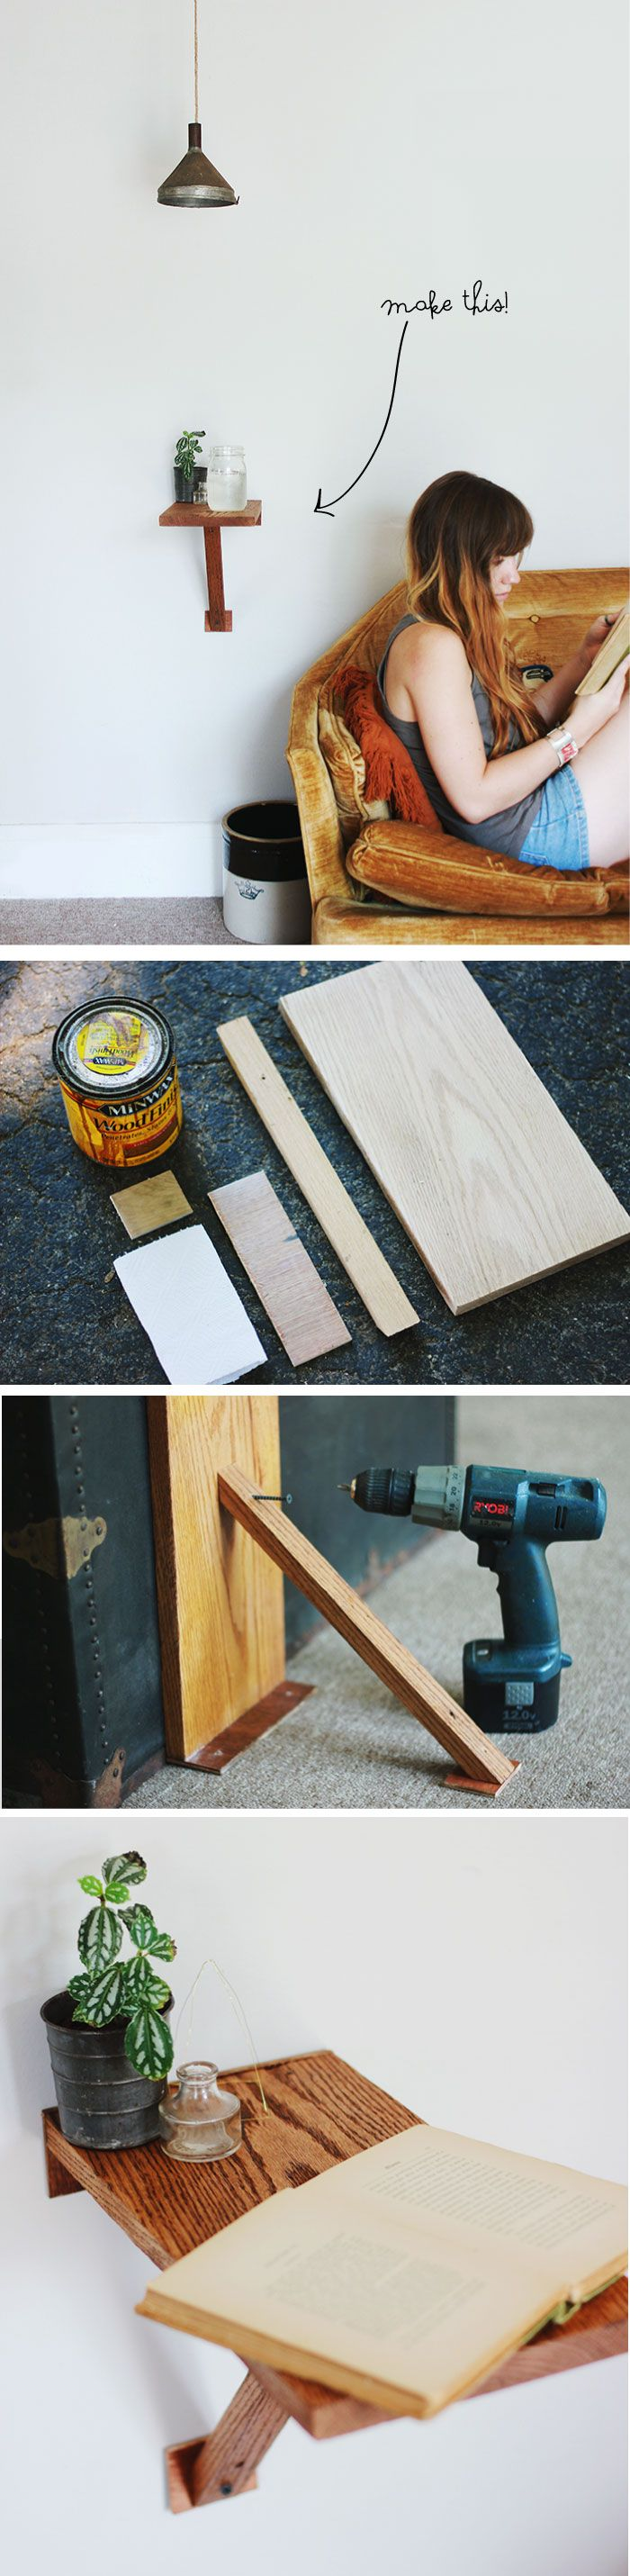 DIY Wall Mount Side Table #DIY #crafts